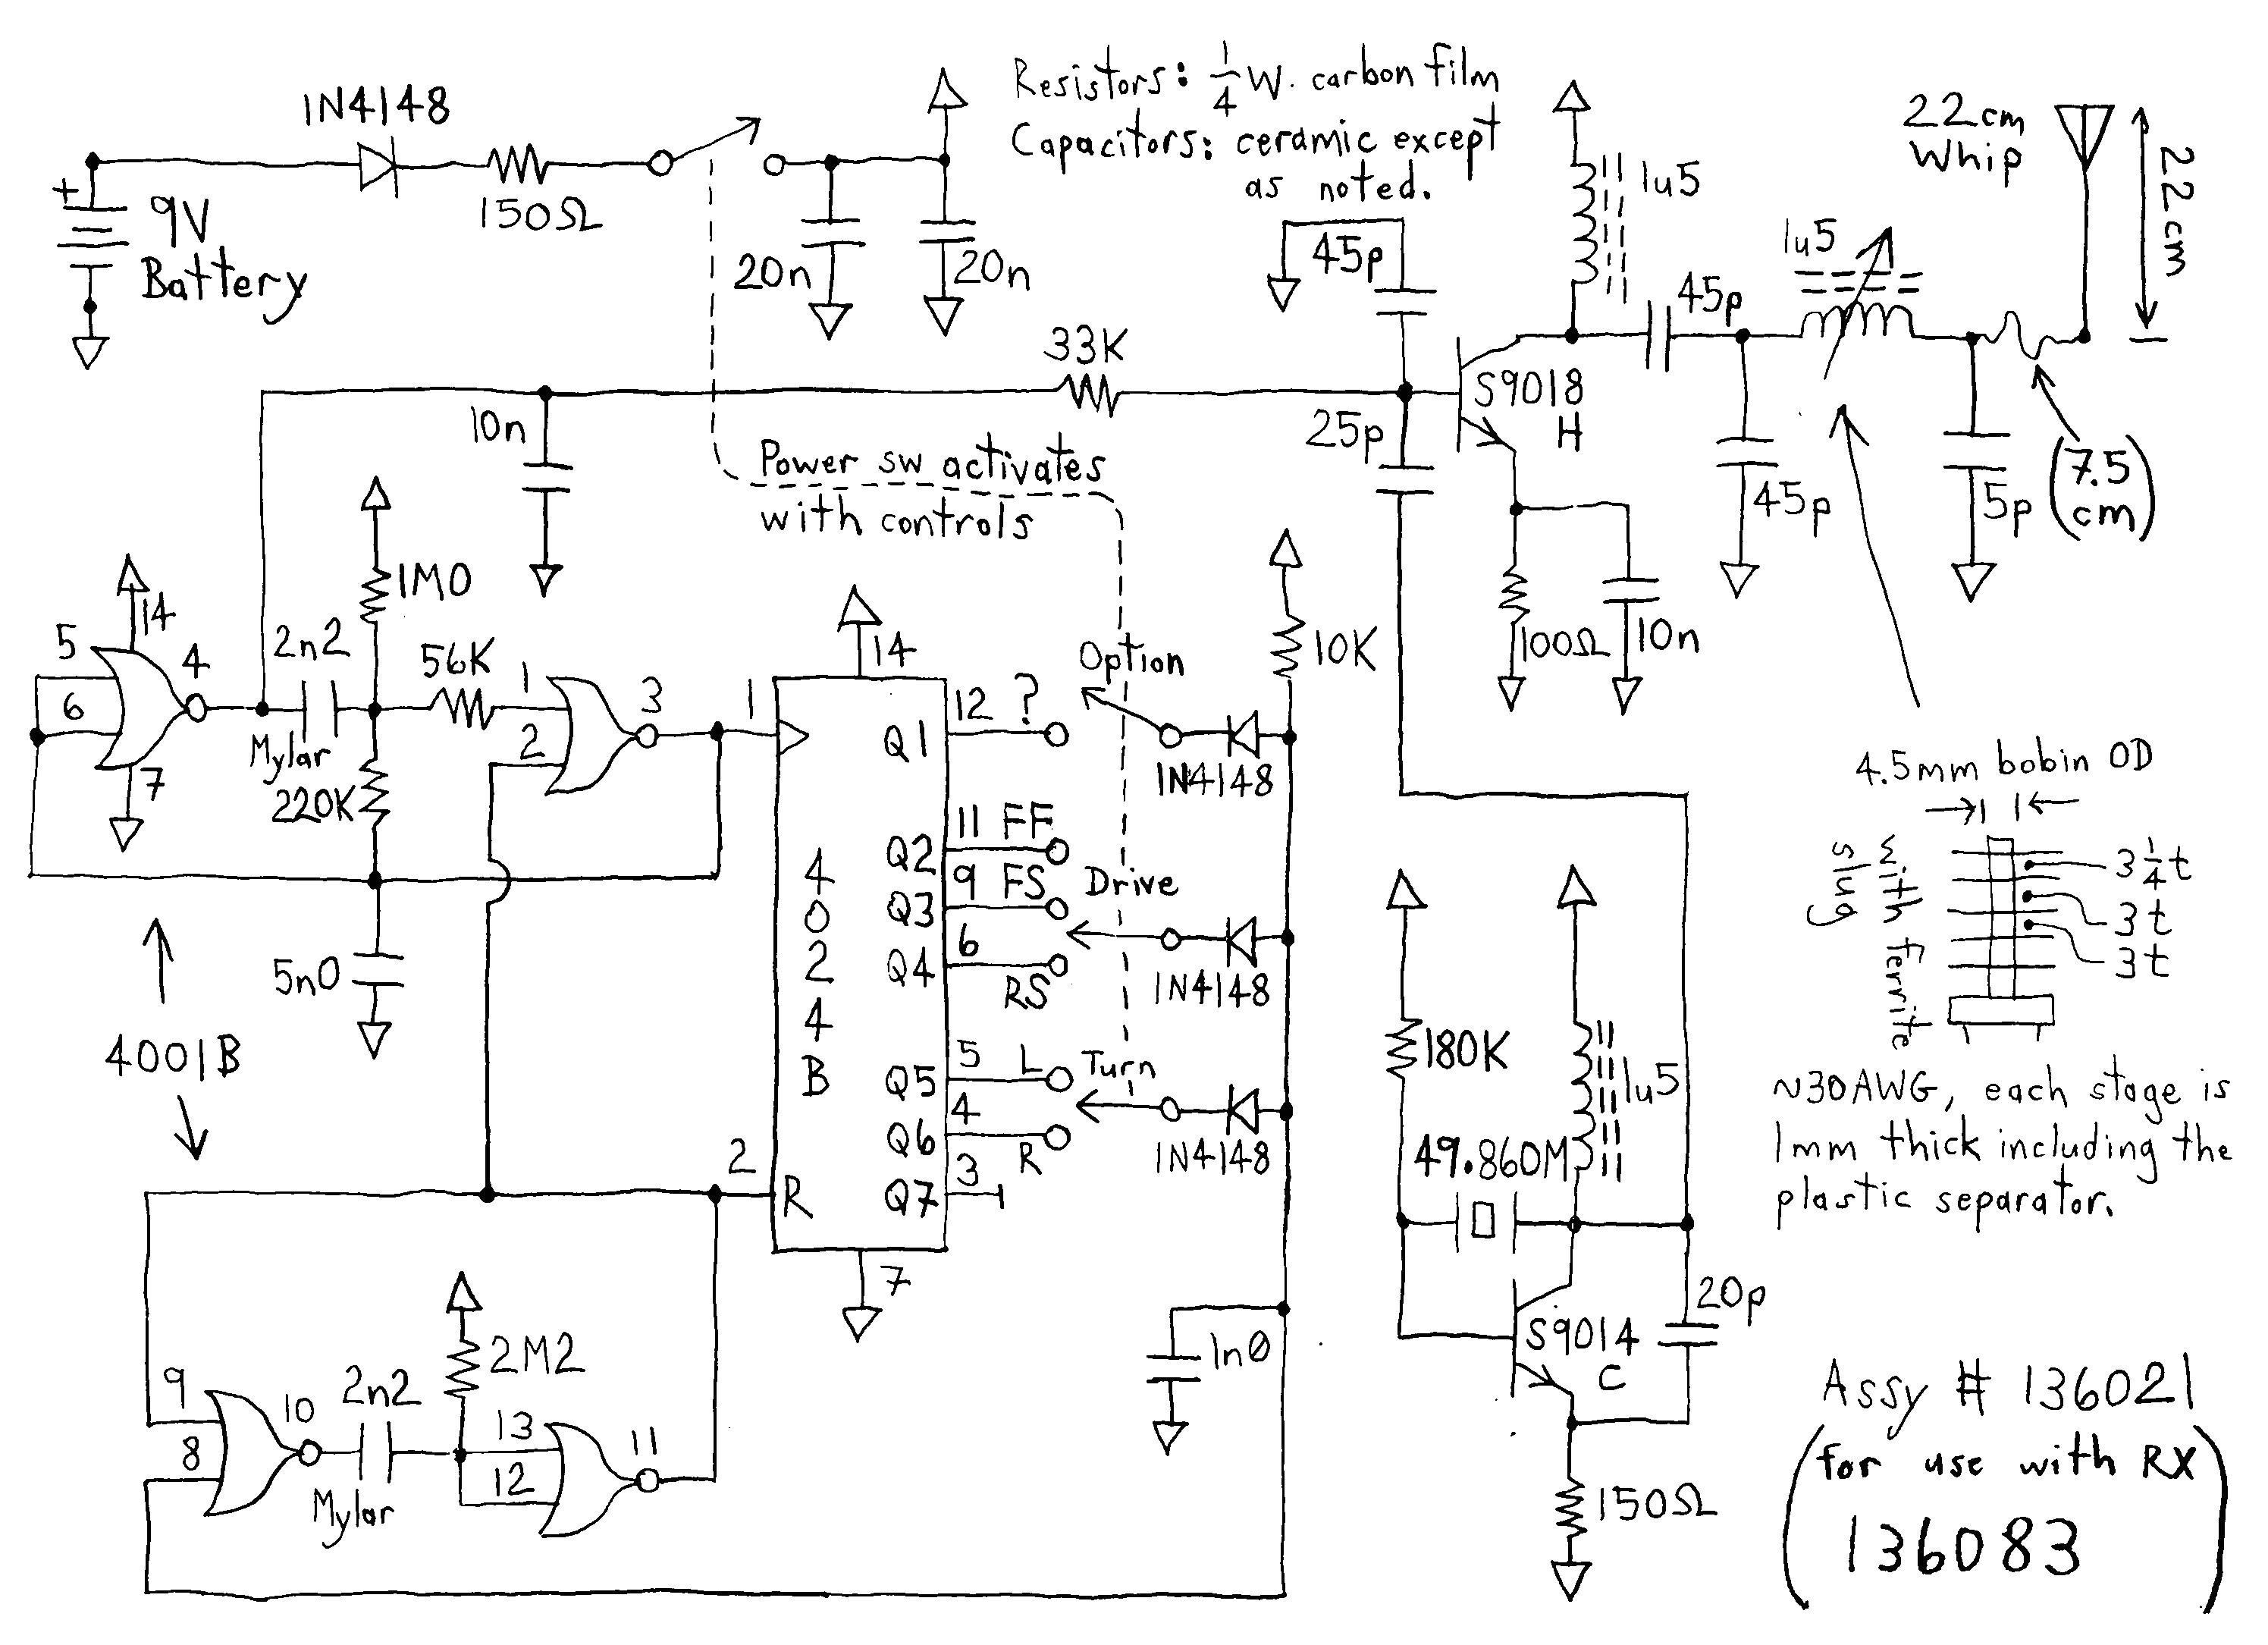 wiring diagram of zen car wiring diagram load wiring diagram of zen car